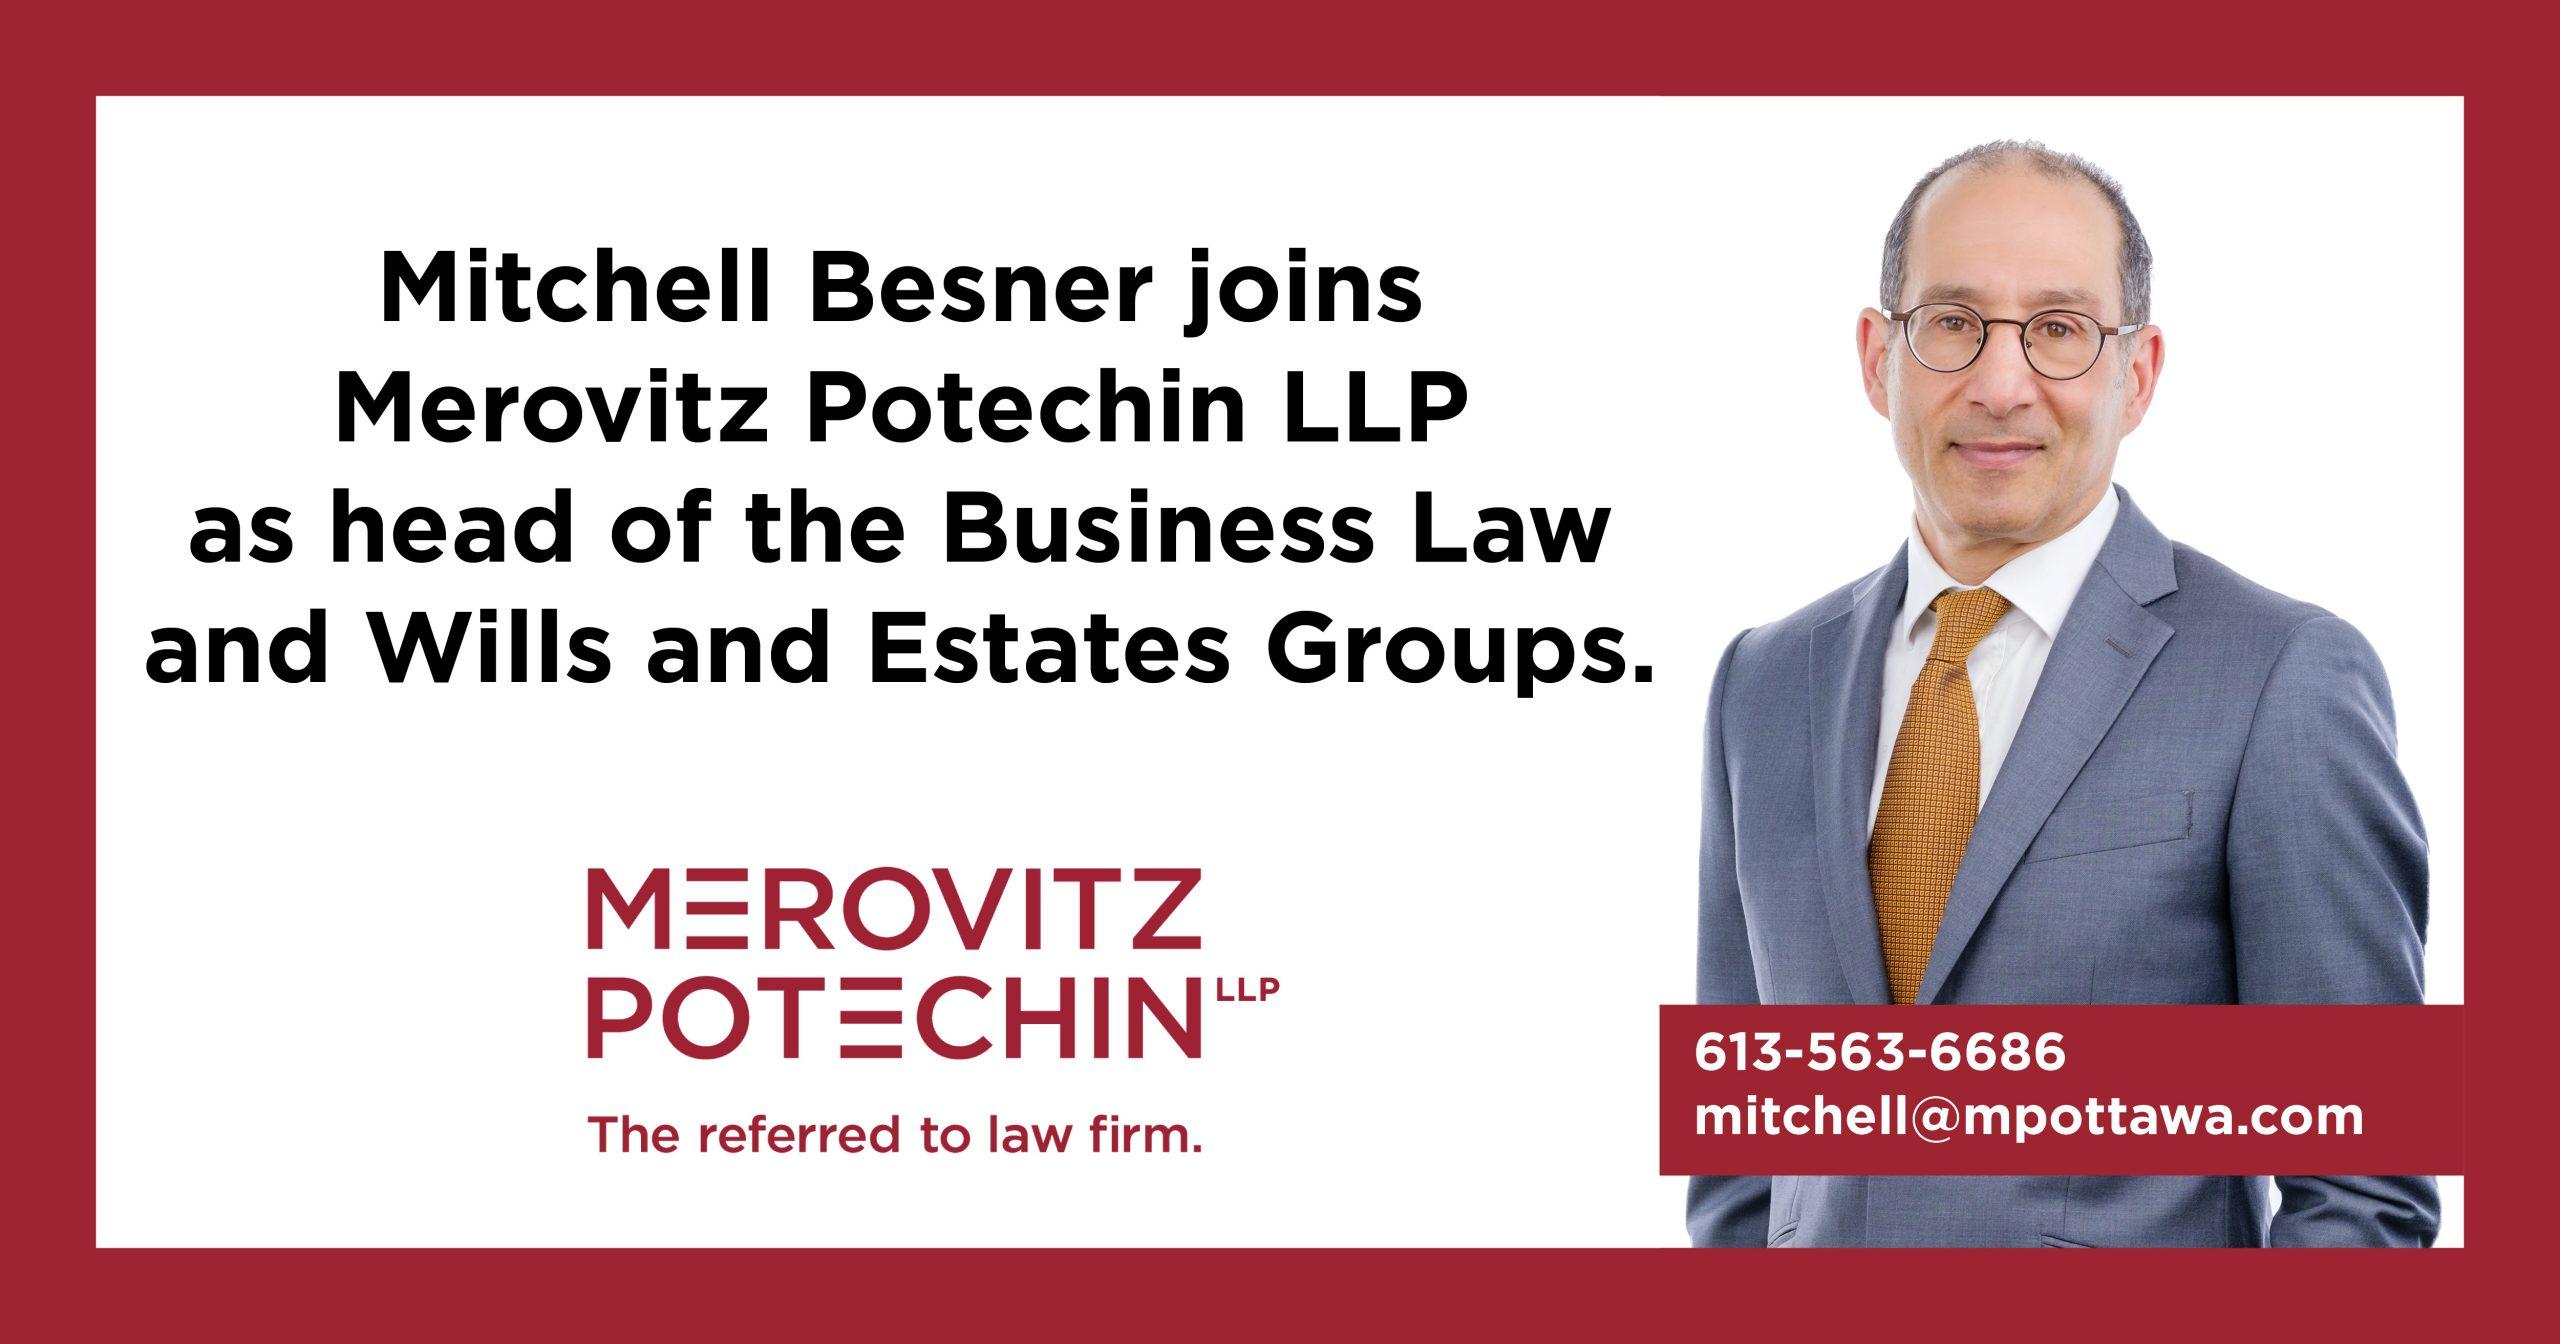 Mitchell Besner joins Merovitz Potechin LLP